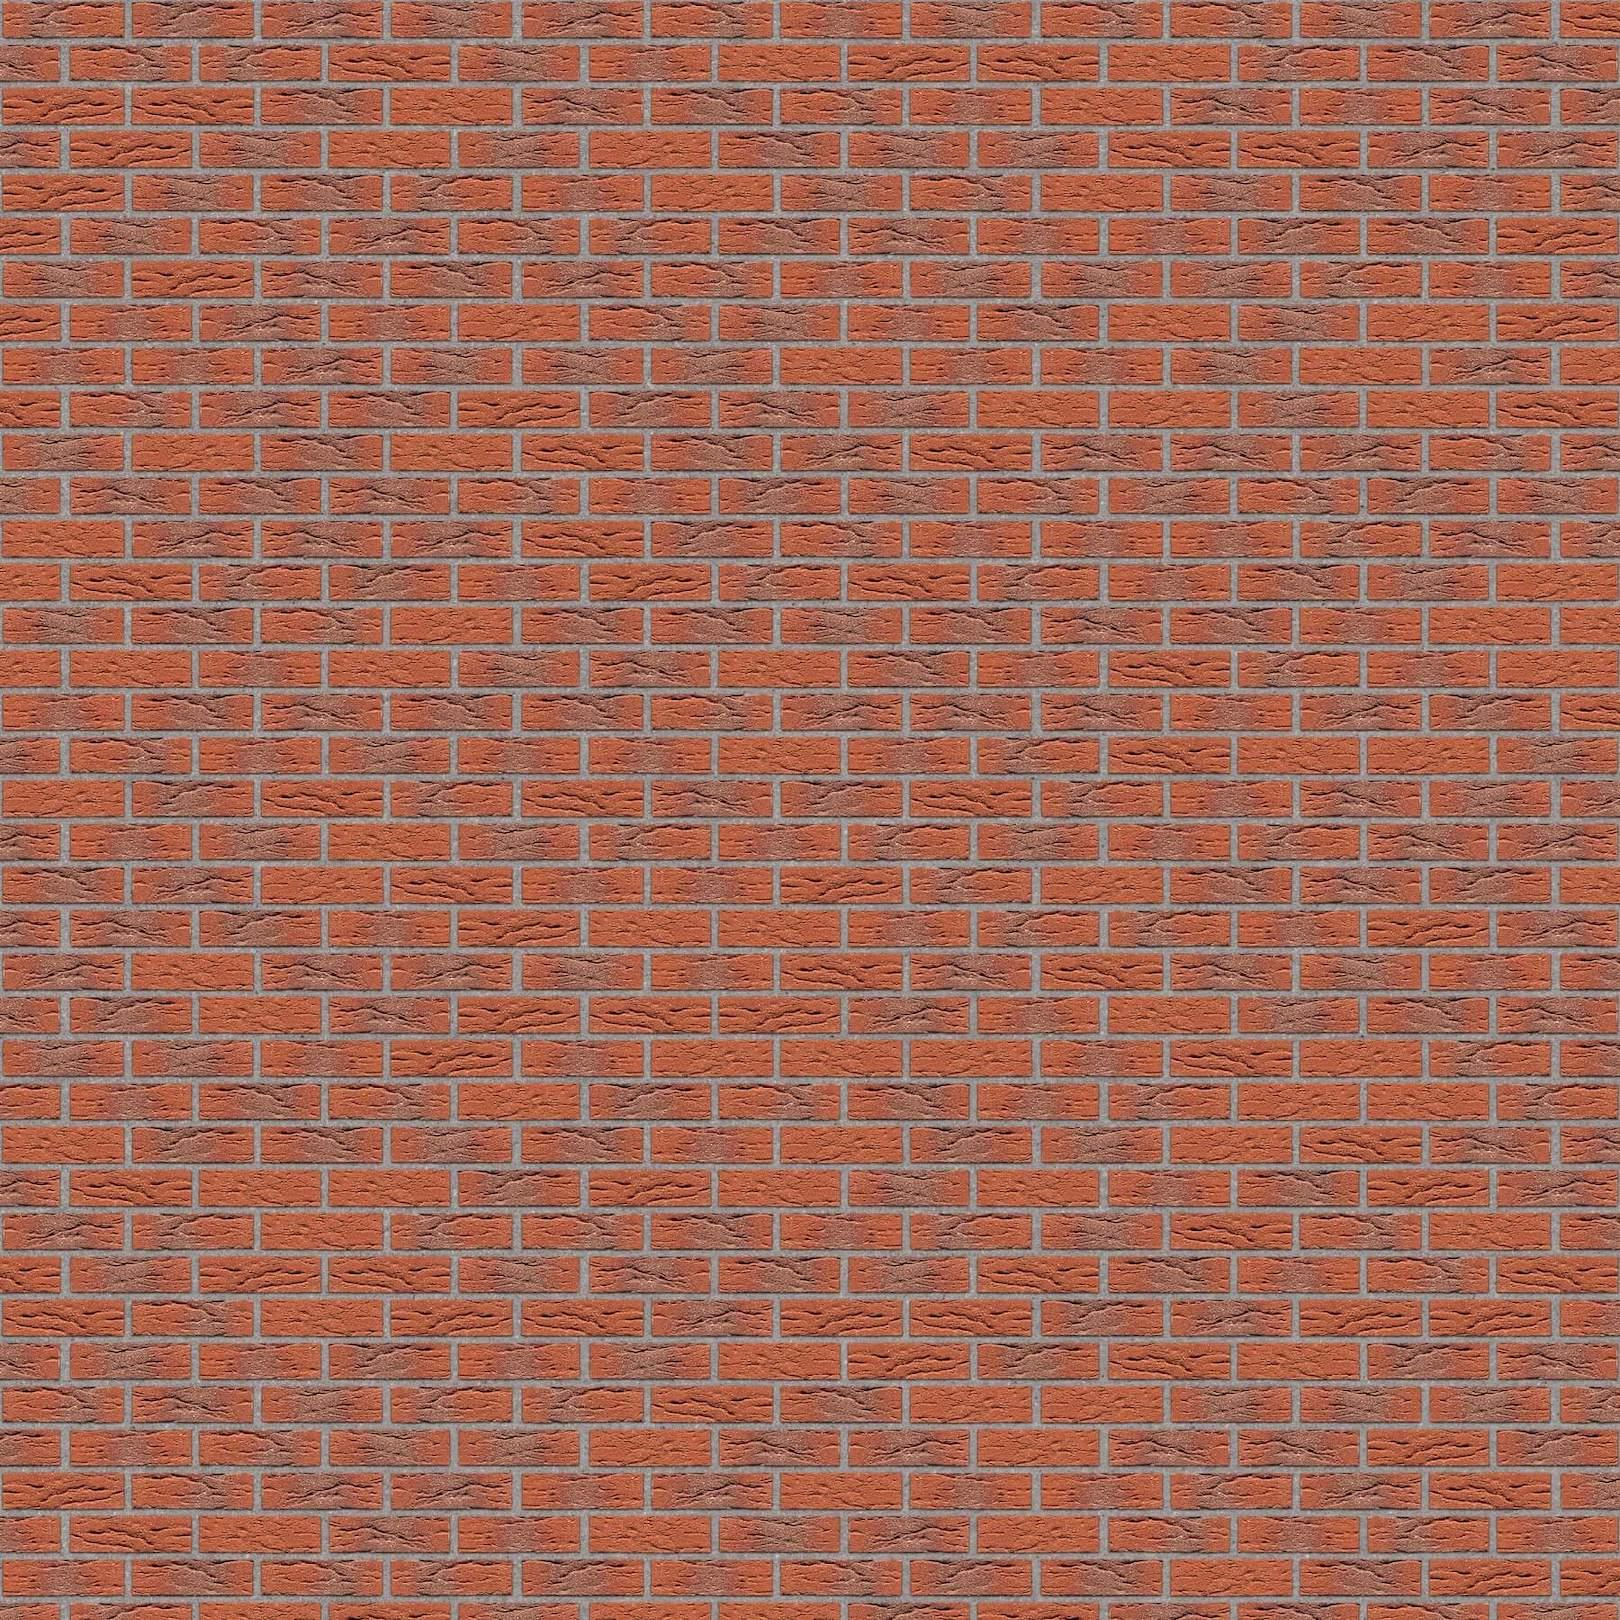 Puna-cigla-Feldhaus-Klinker-brick-house-nf-k-345-SIva Fuga